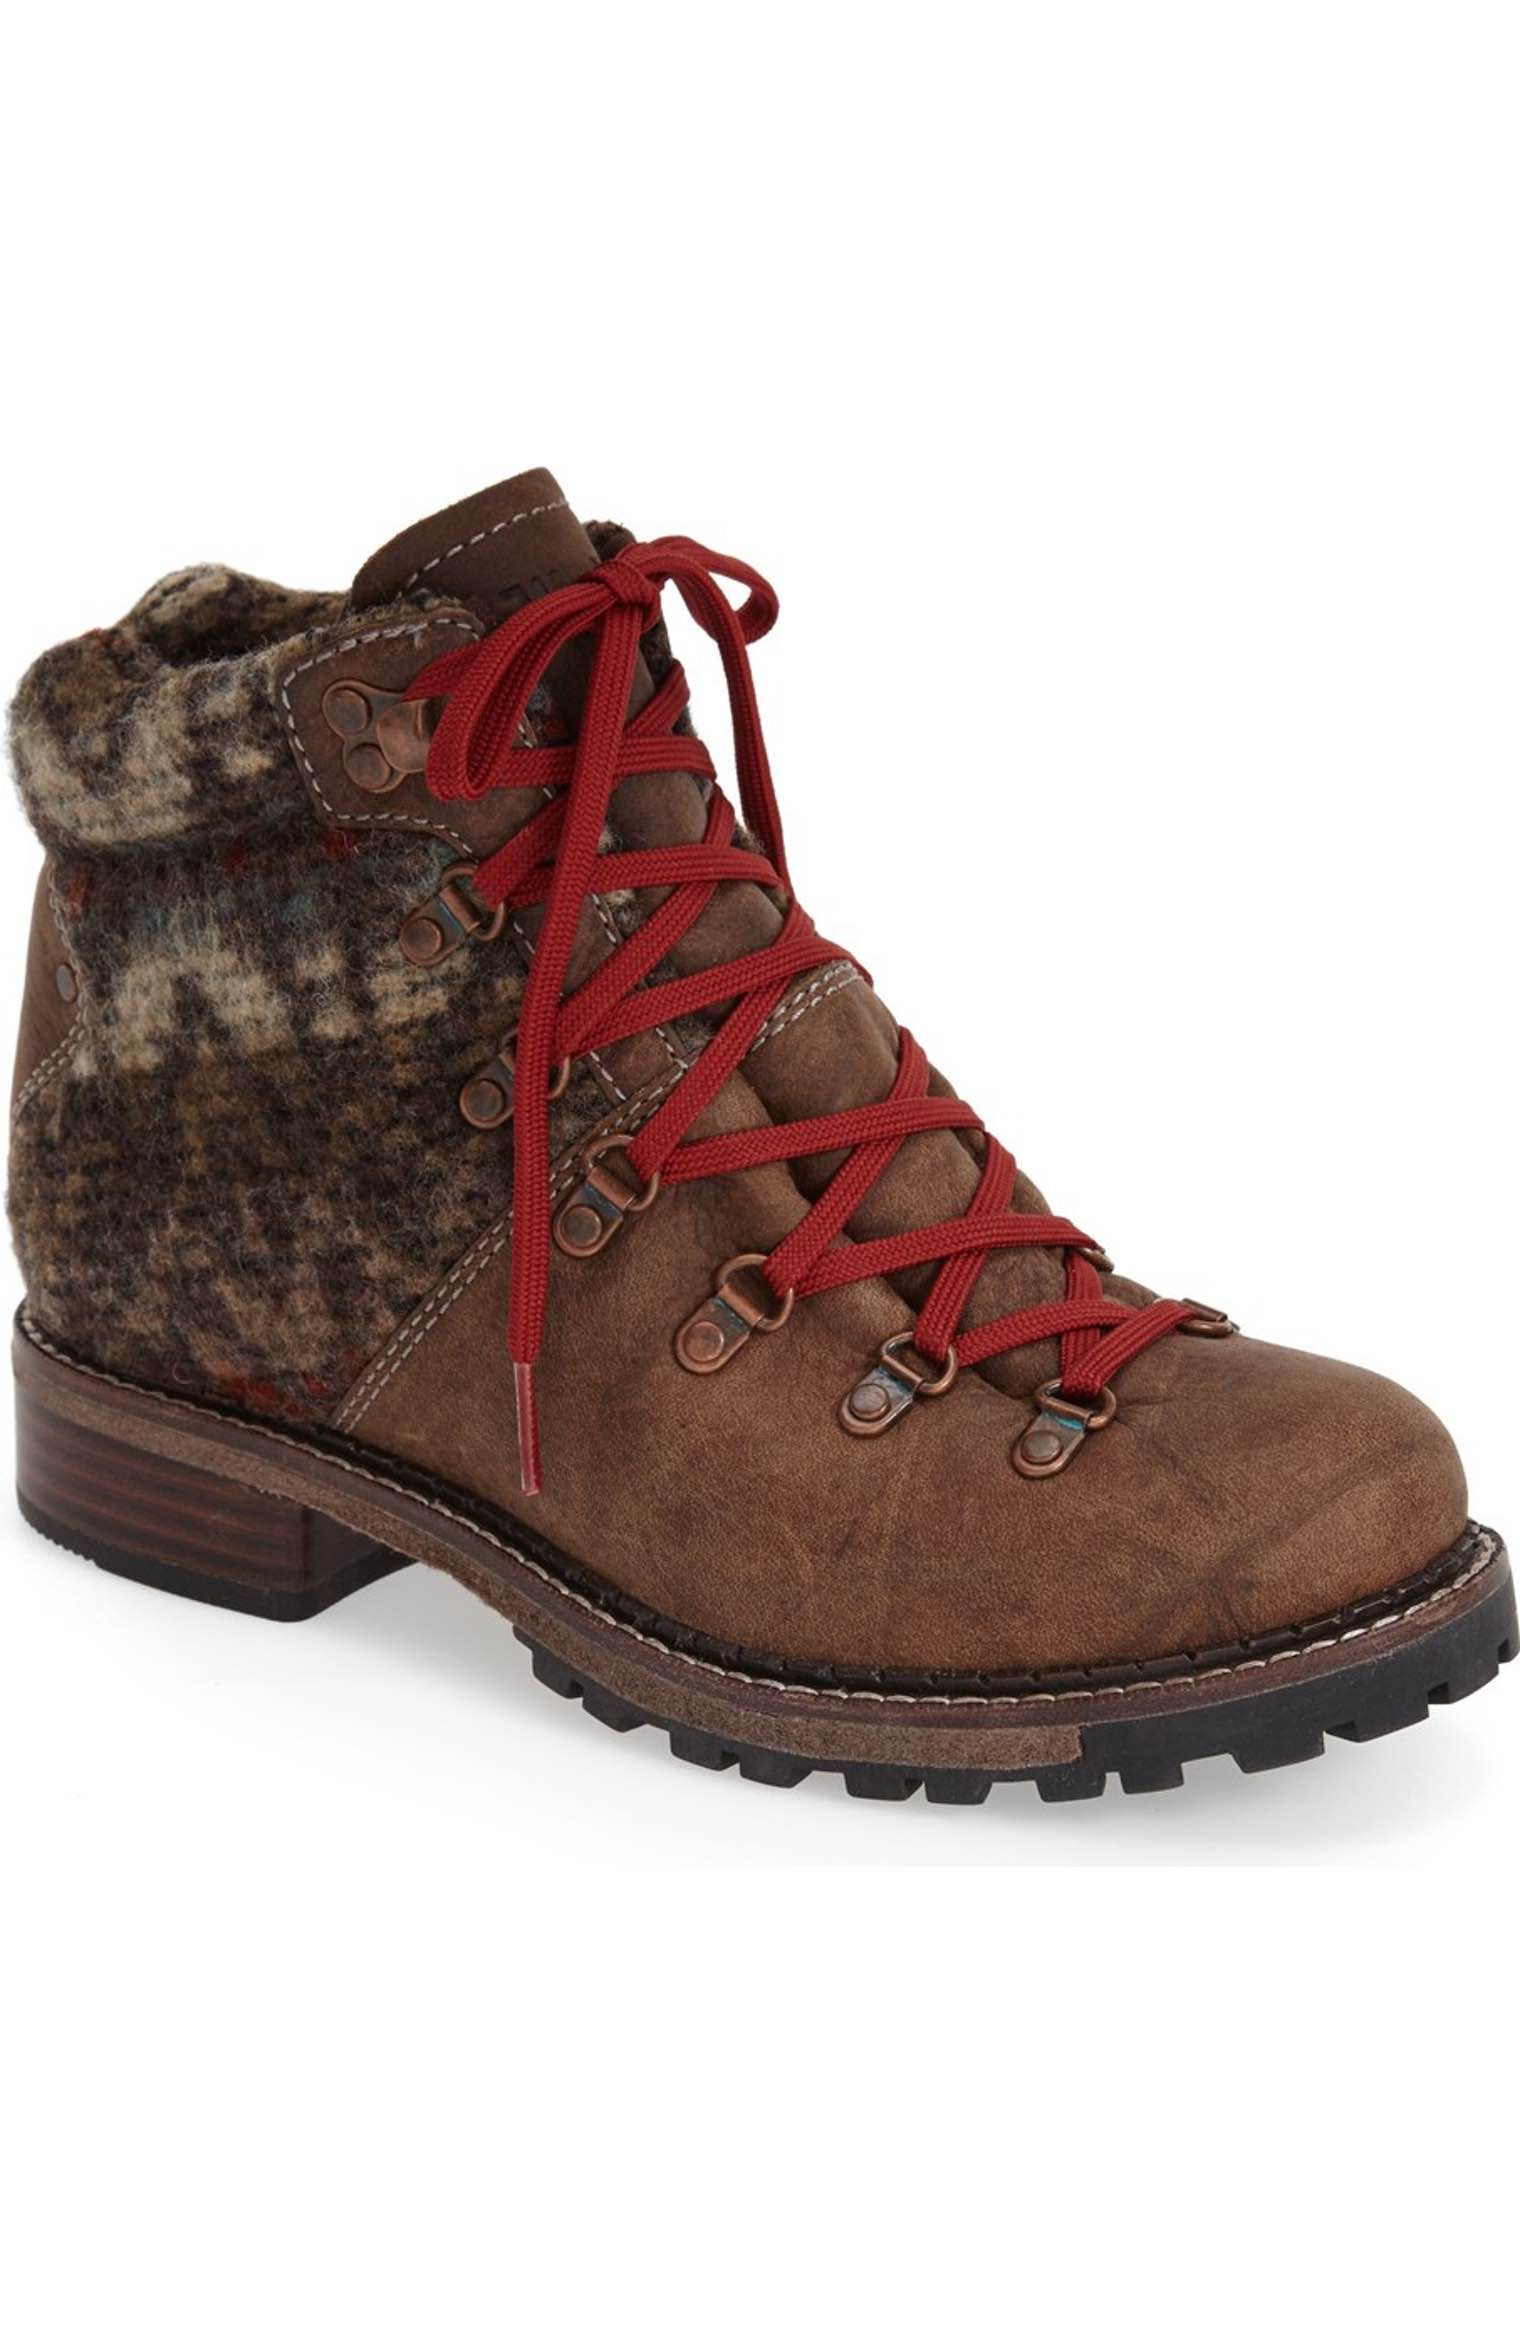 27bbaa66f7b Main Image - Woolrich 'Rockies' Hiking Boot (Women) | Winter ...